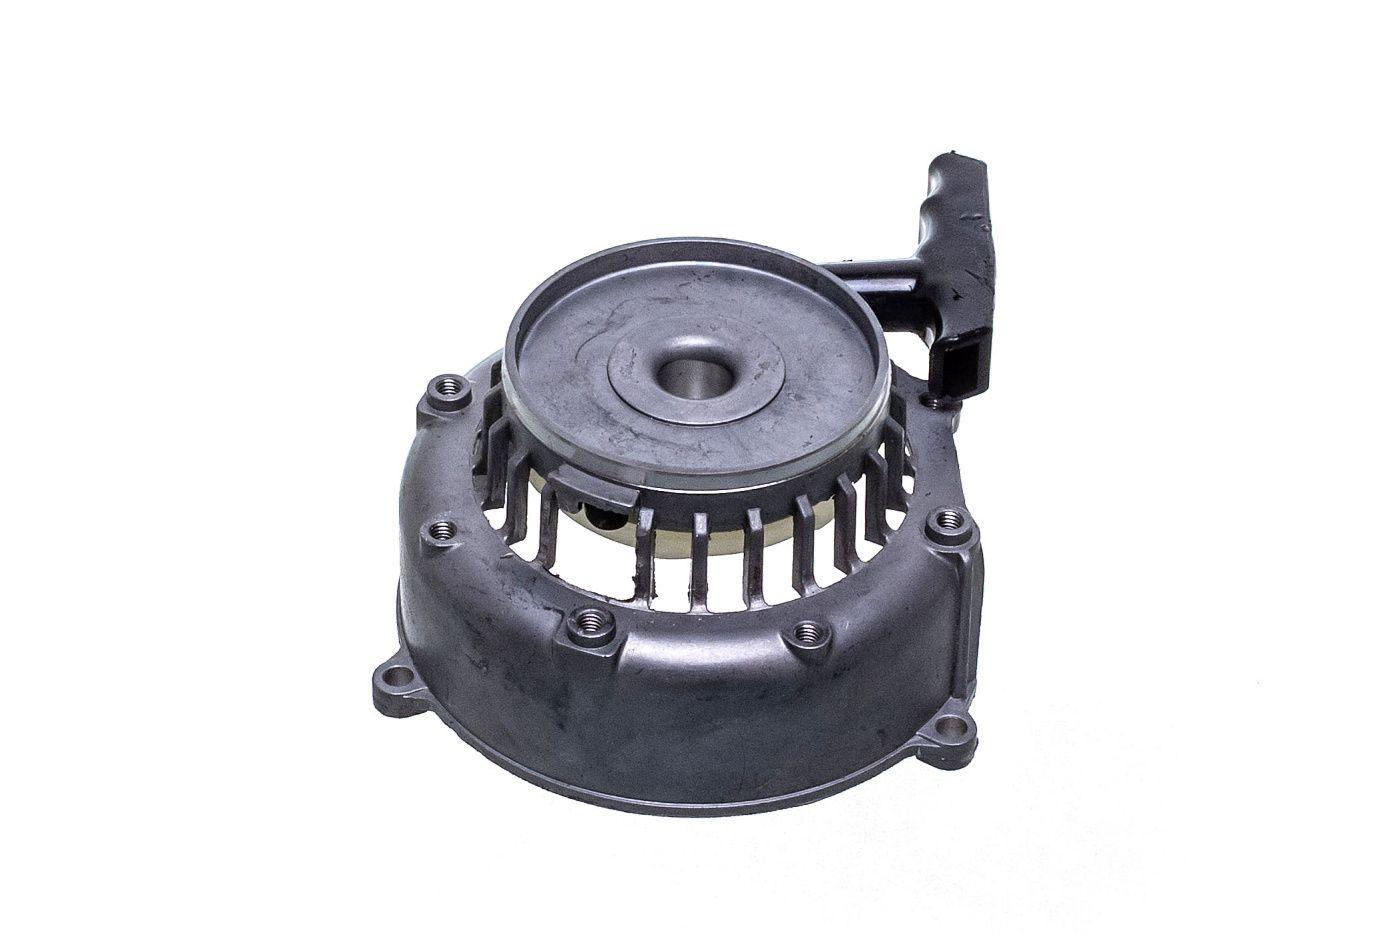 Starter kompletní Oleo-mac Sparta 25 26 250 - 4161160AR